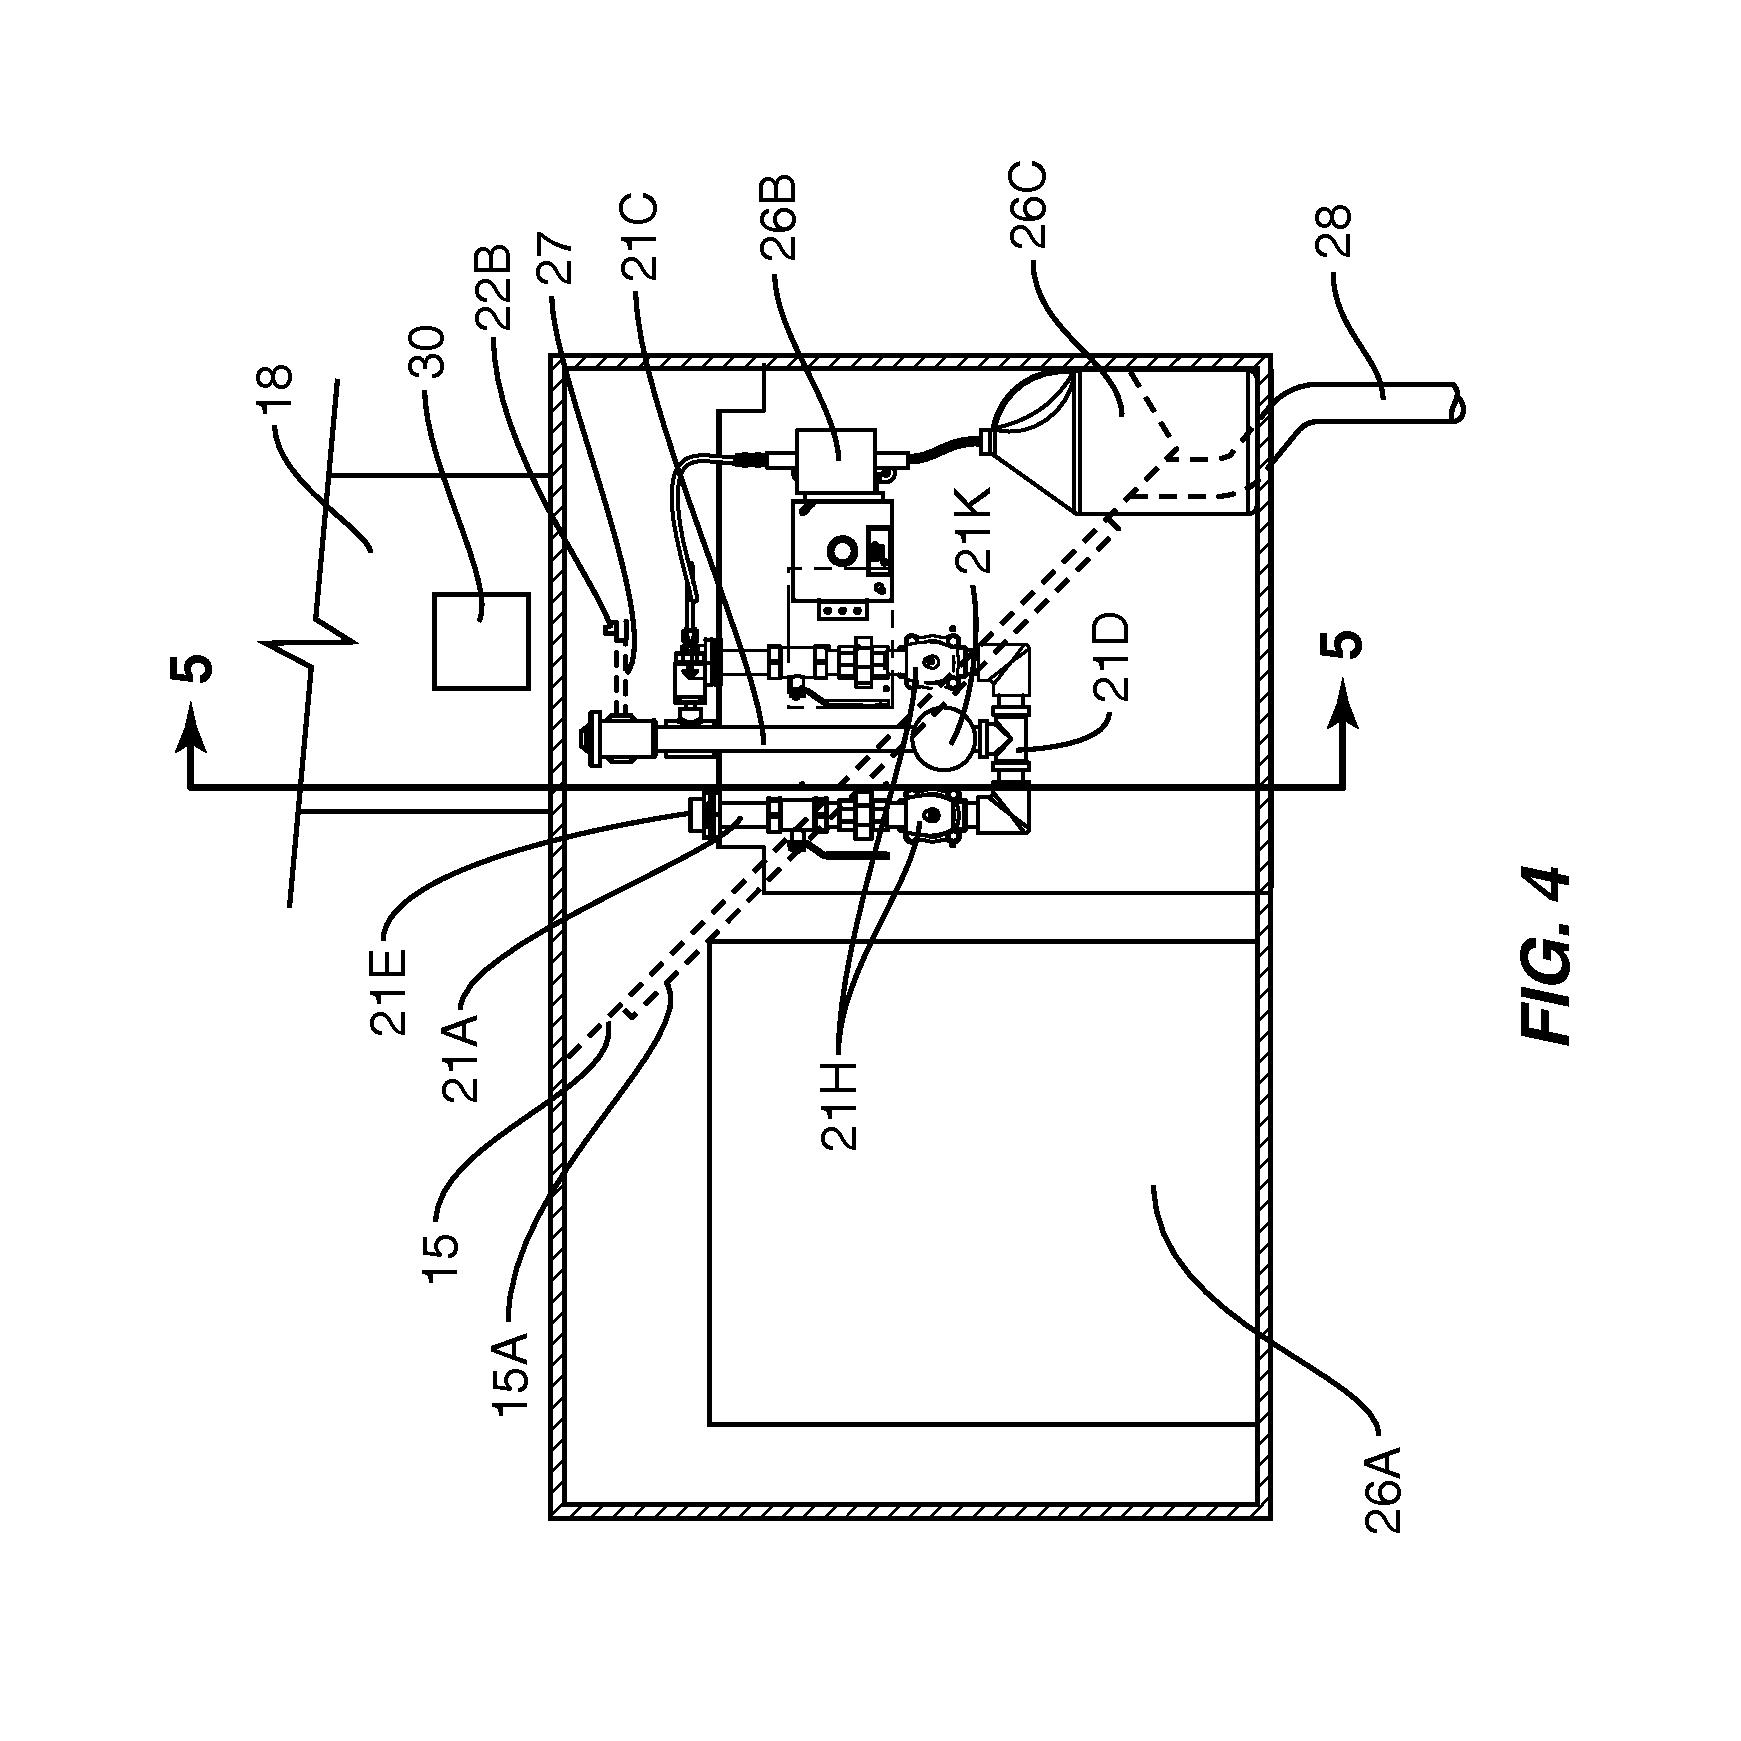 Diagram Ansul System Wiring Diagram Circuit Kitchen